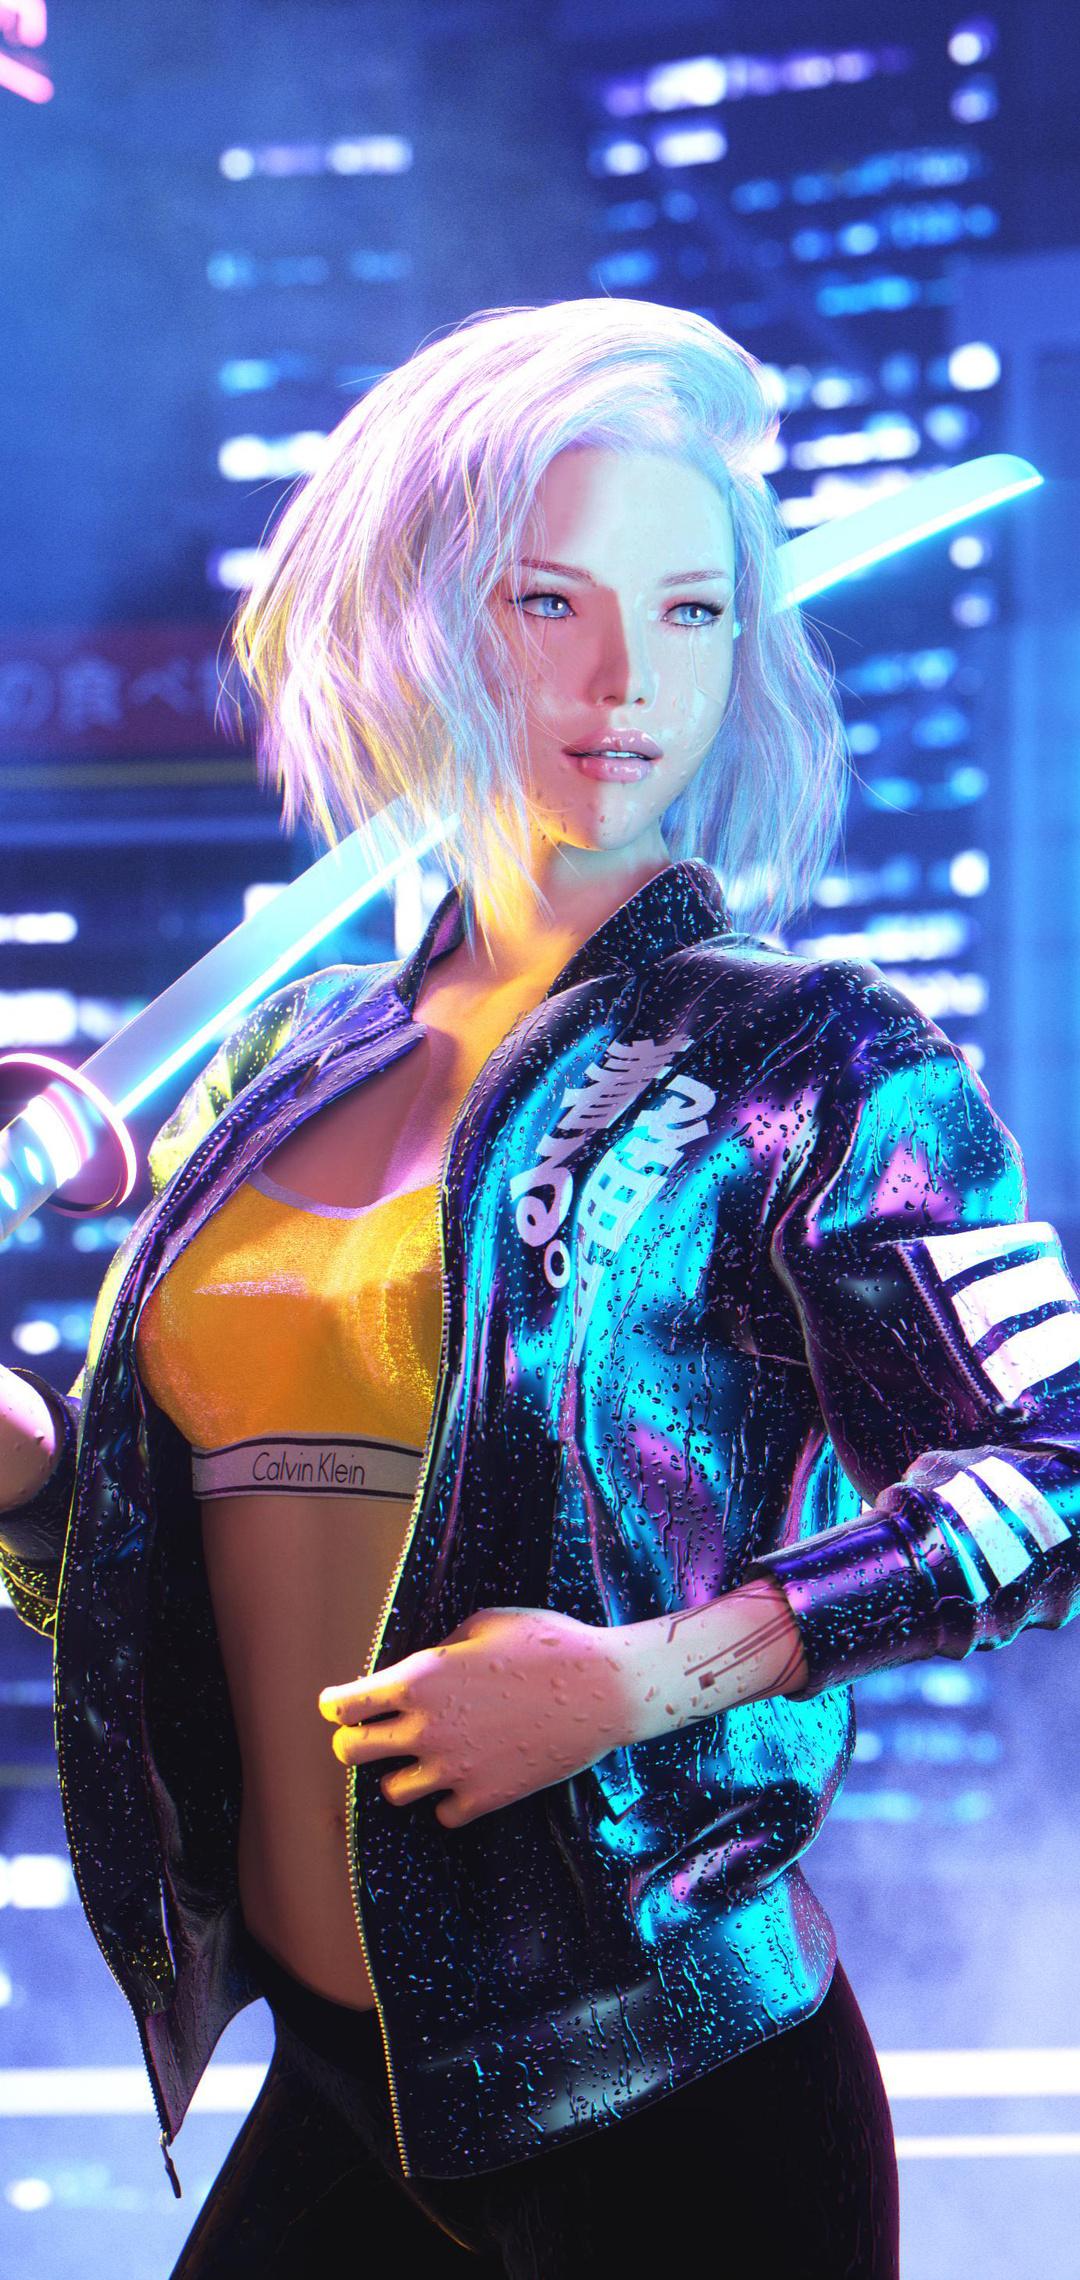 1080x2280 Cyberpunk 2077 Girl 4k 2020 One Plus 6,Huawei ...